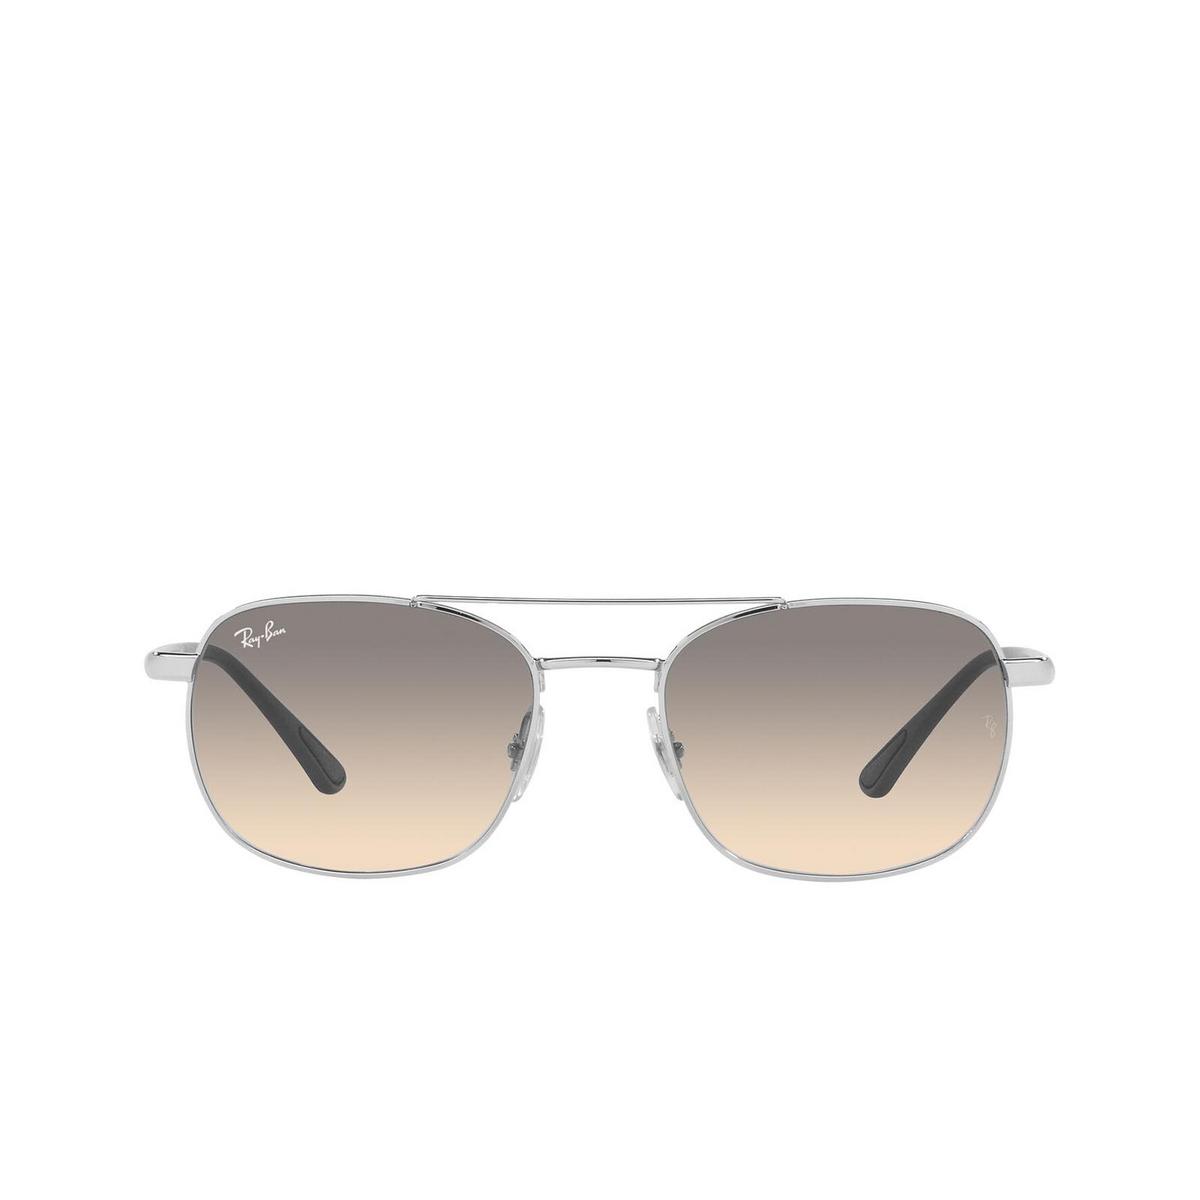 Ray-Ban® Square Sunglasses: RB3670 color Silver 003/32.